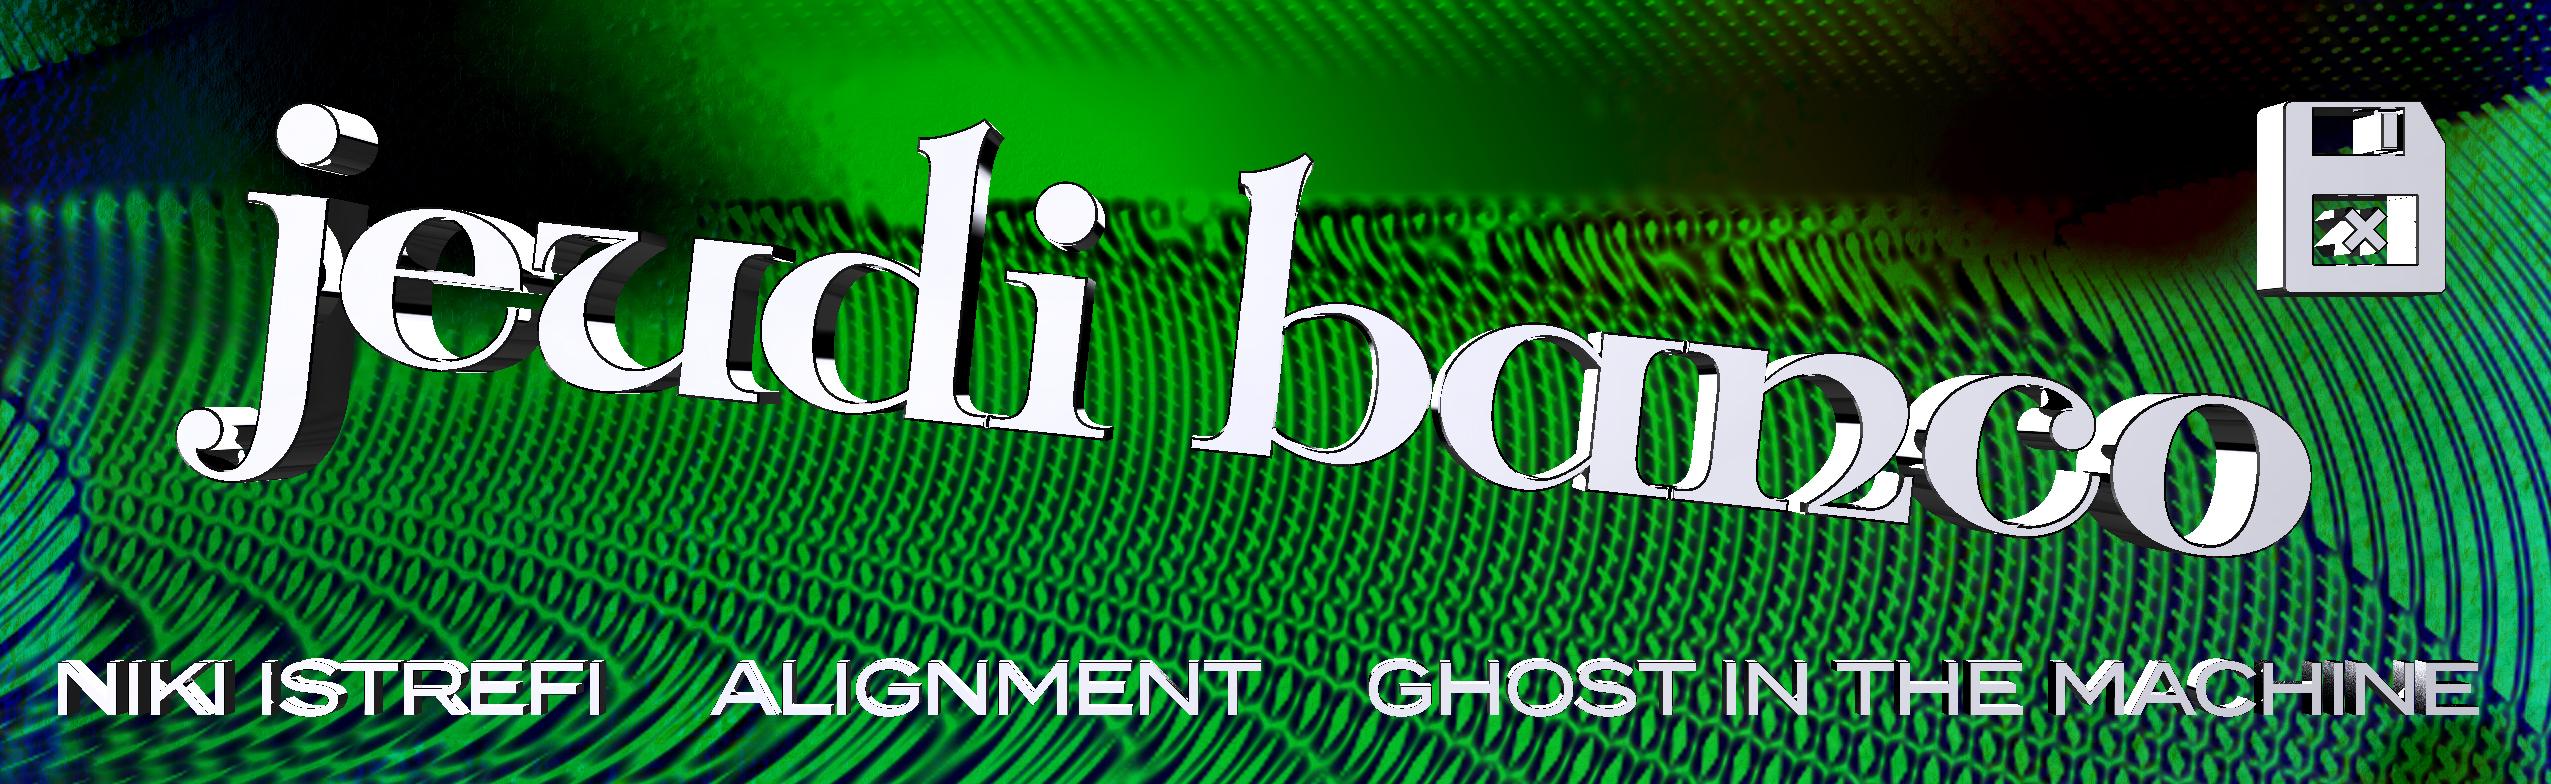 Jeudi Banco : Ghost in the machine • Niki Istrefi • Alignment